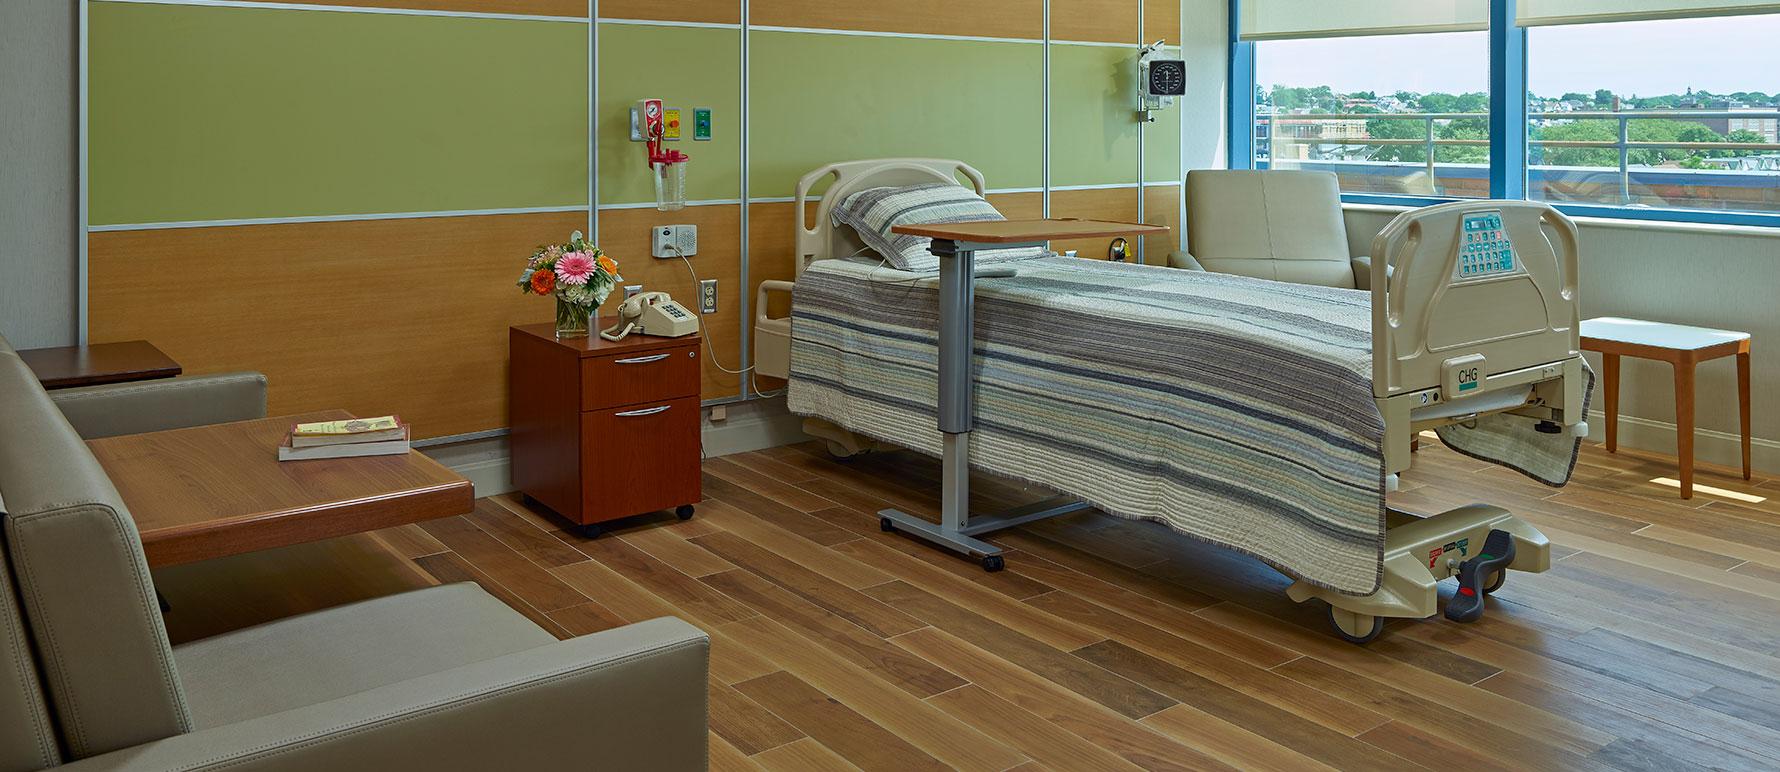 Jamaica Hospital Medical Center - JHMC has brought high